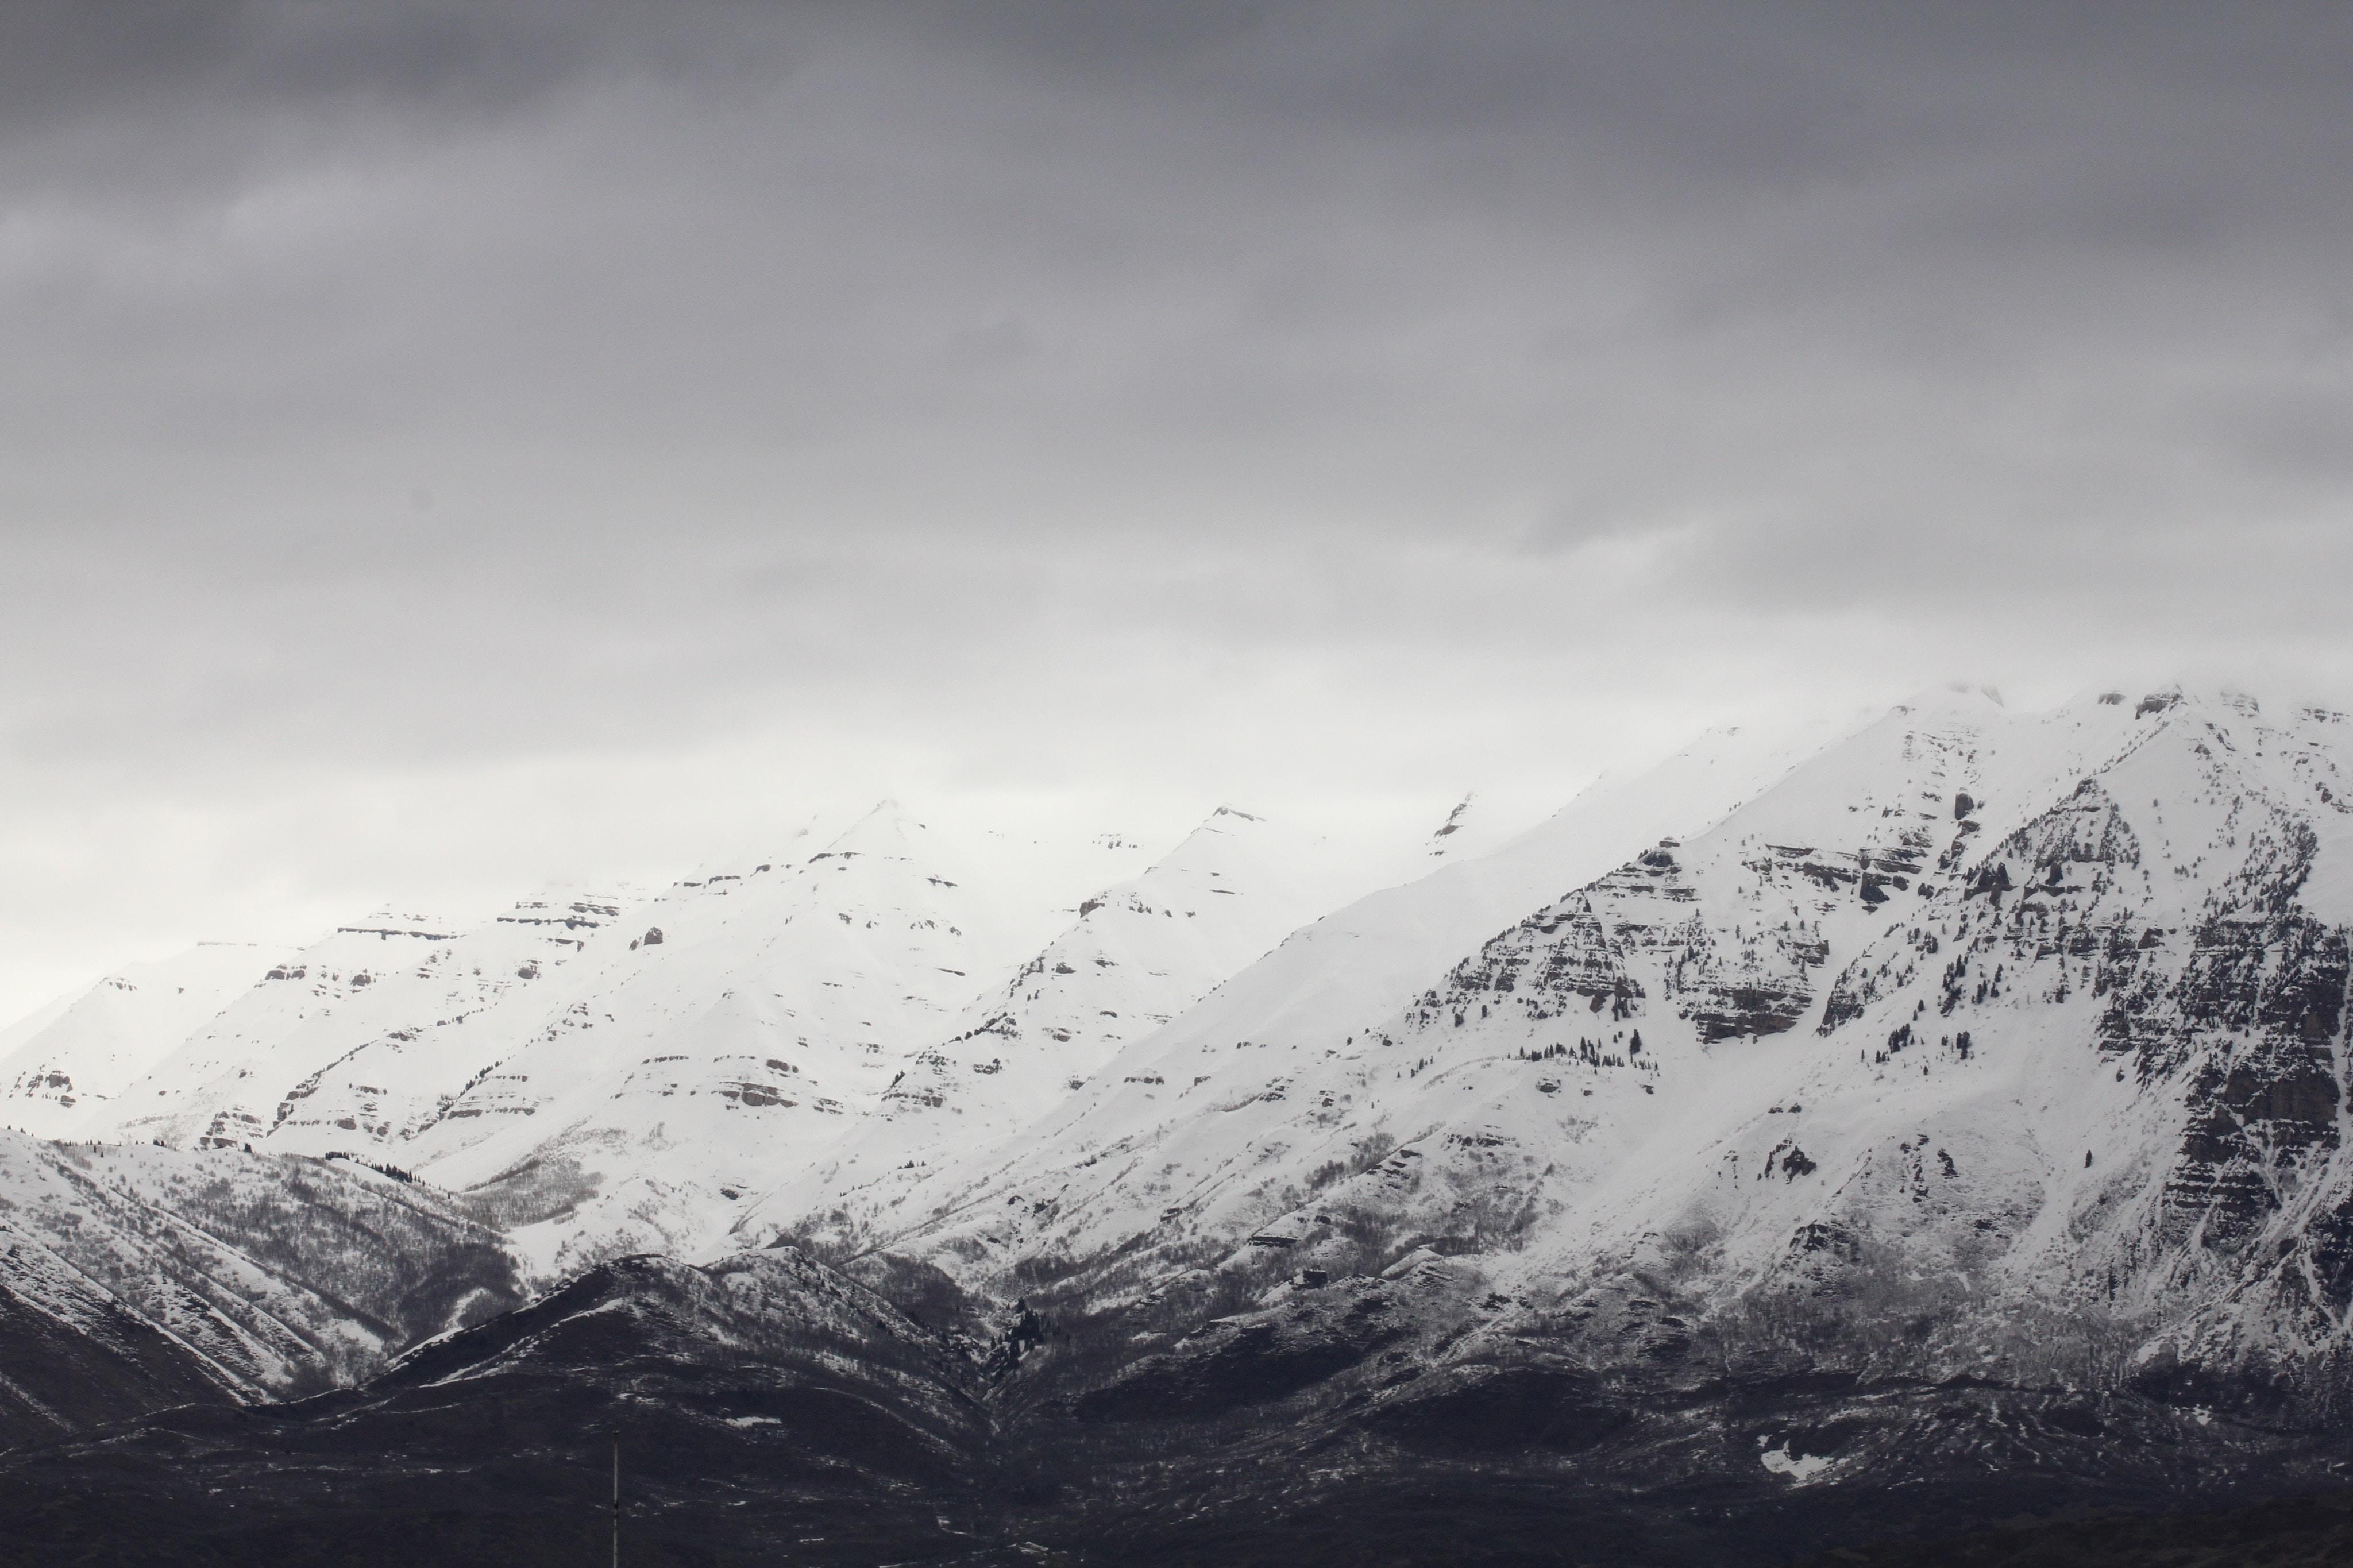 snowy mountain cap